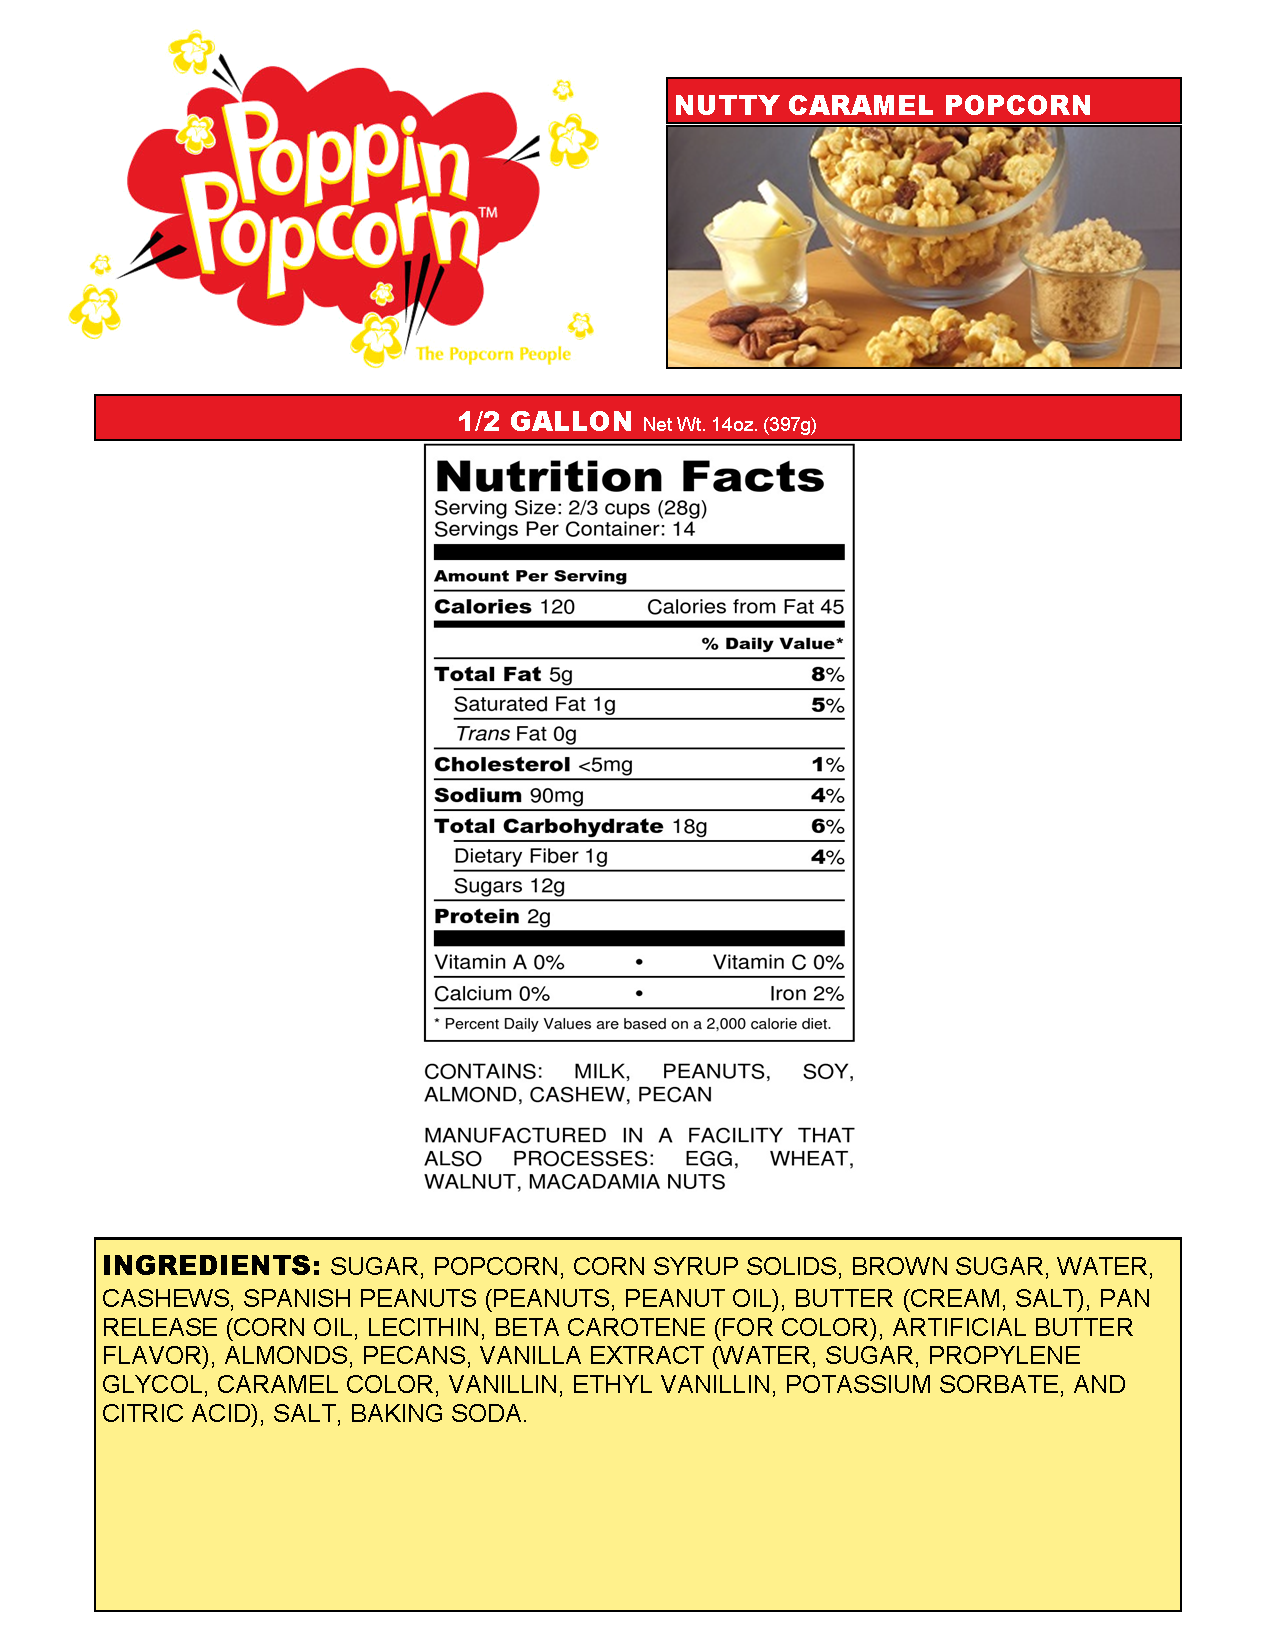 Nutty Caramel Web Nutritional